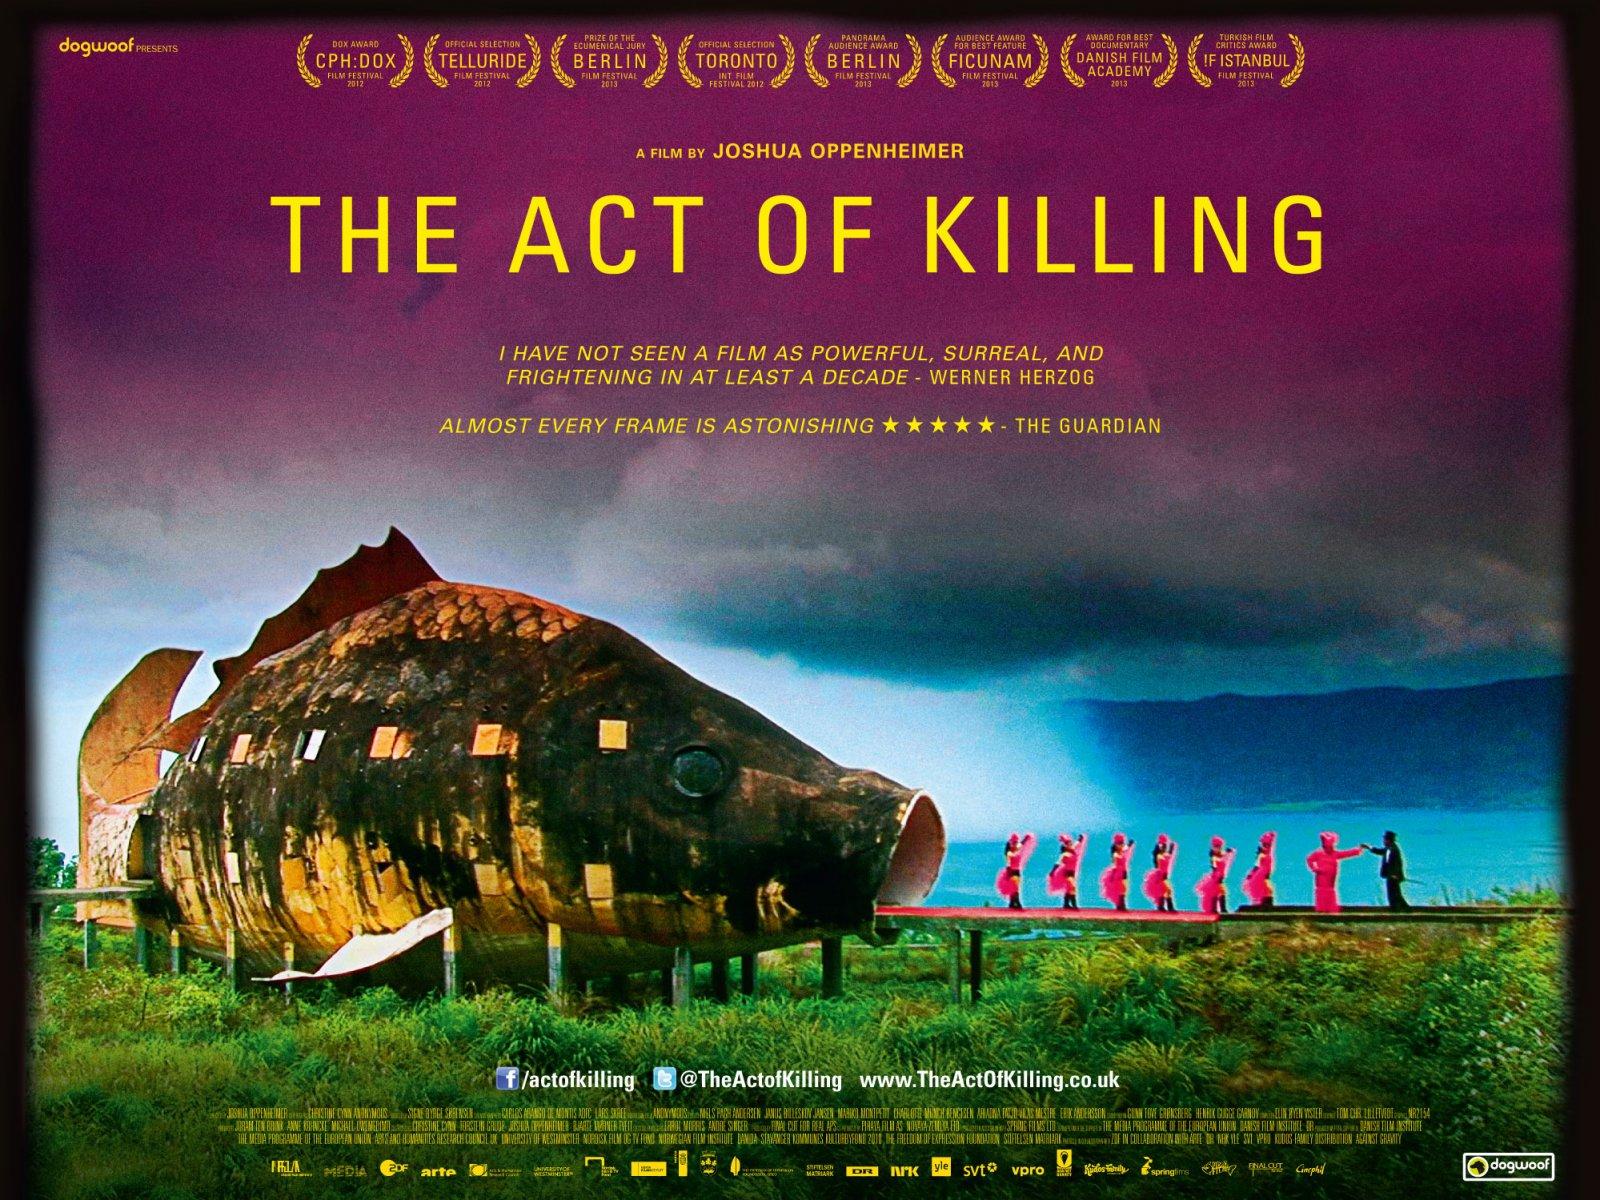 The_Act_of_Killing_Quad_Dogwoof_1600_1200_85